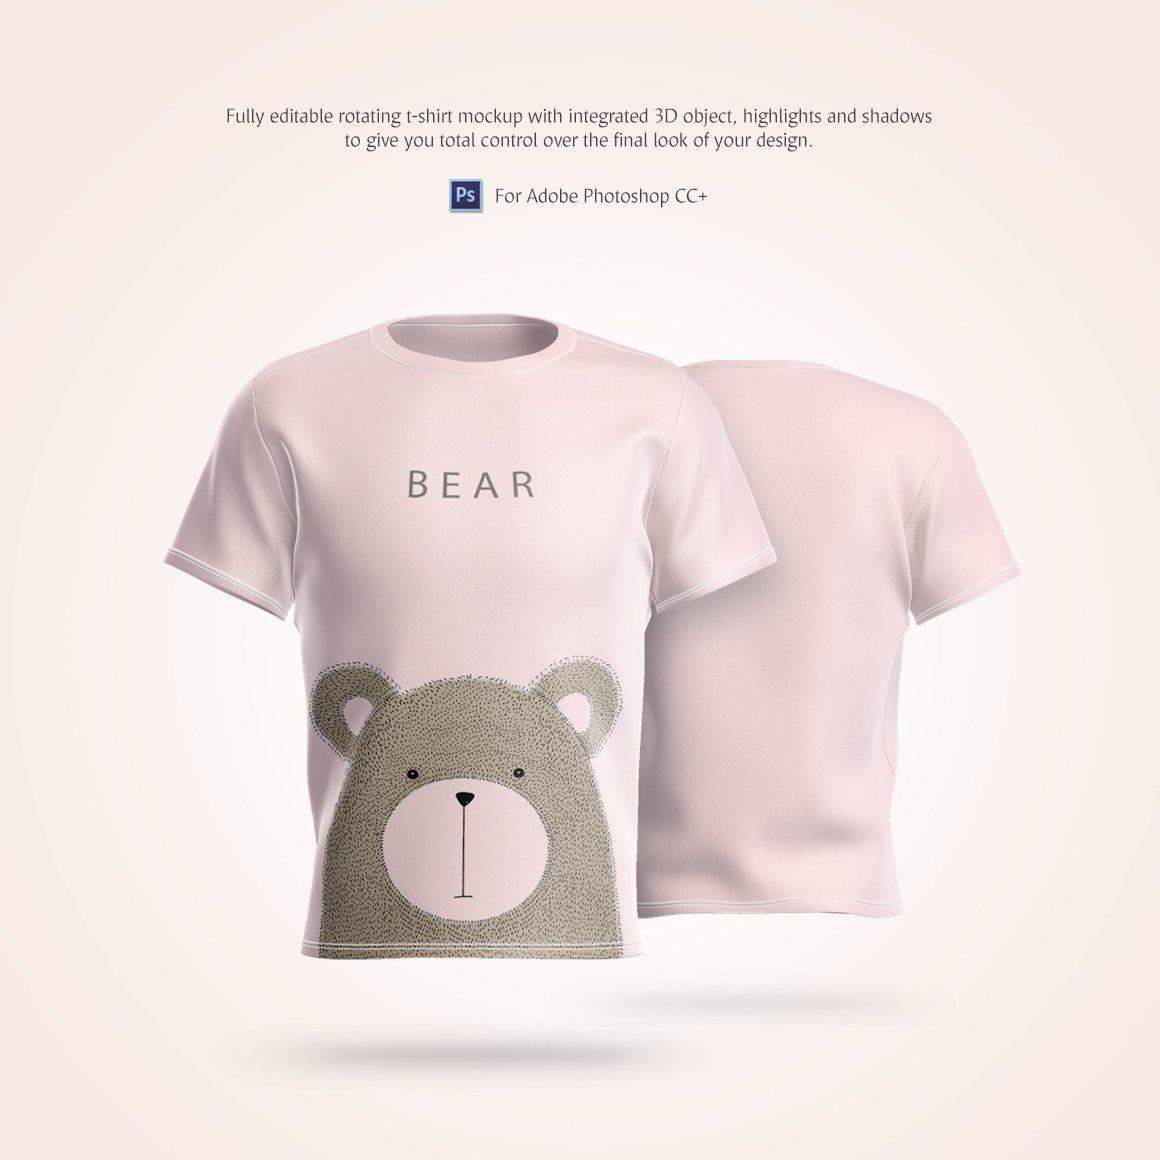 T恤设计360°旋转效果图样机模板 T-Shirt Animated Mockup插图(1)